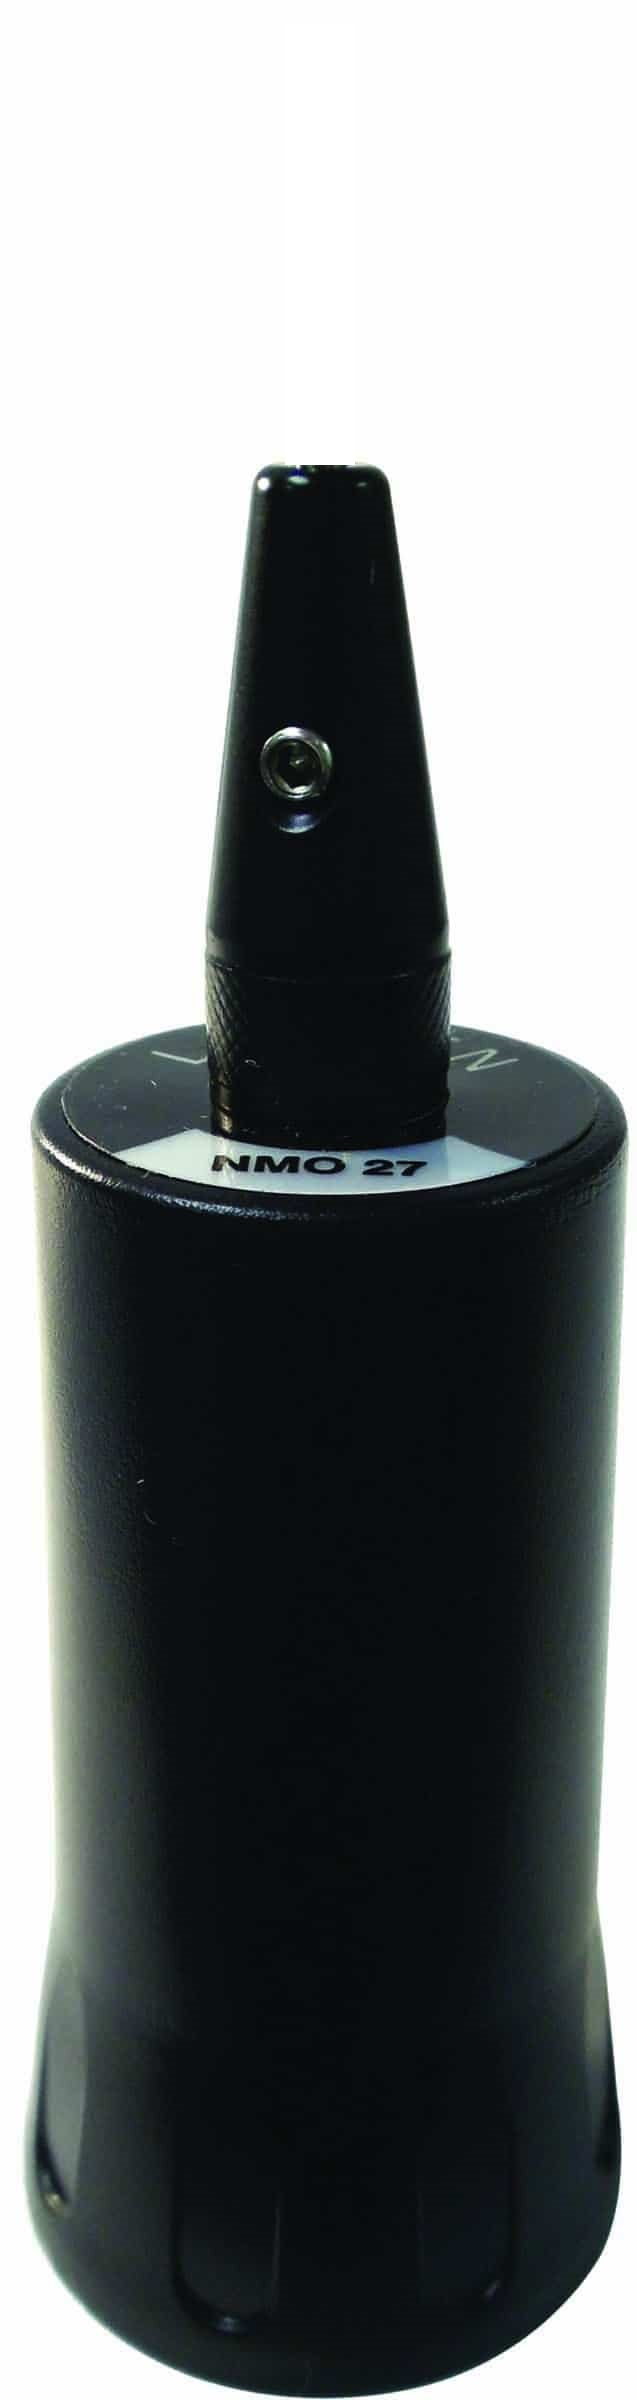 NMO27BCO - Larsen Black 27Mhz Antenna COIL ONLY